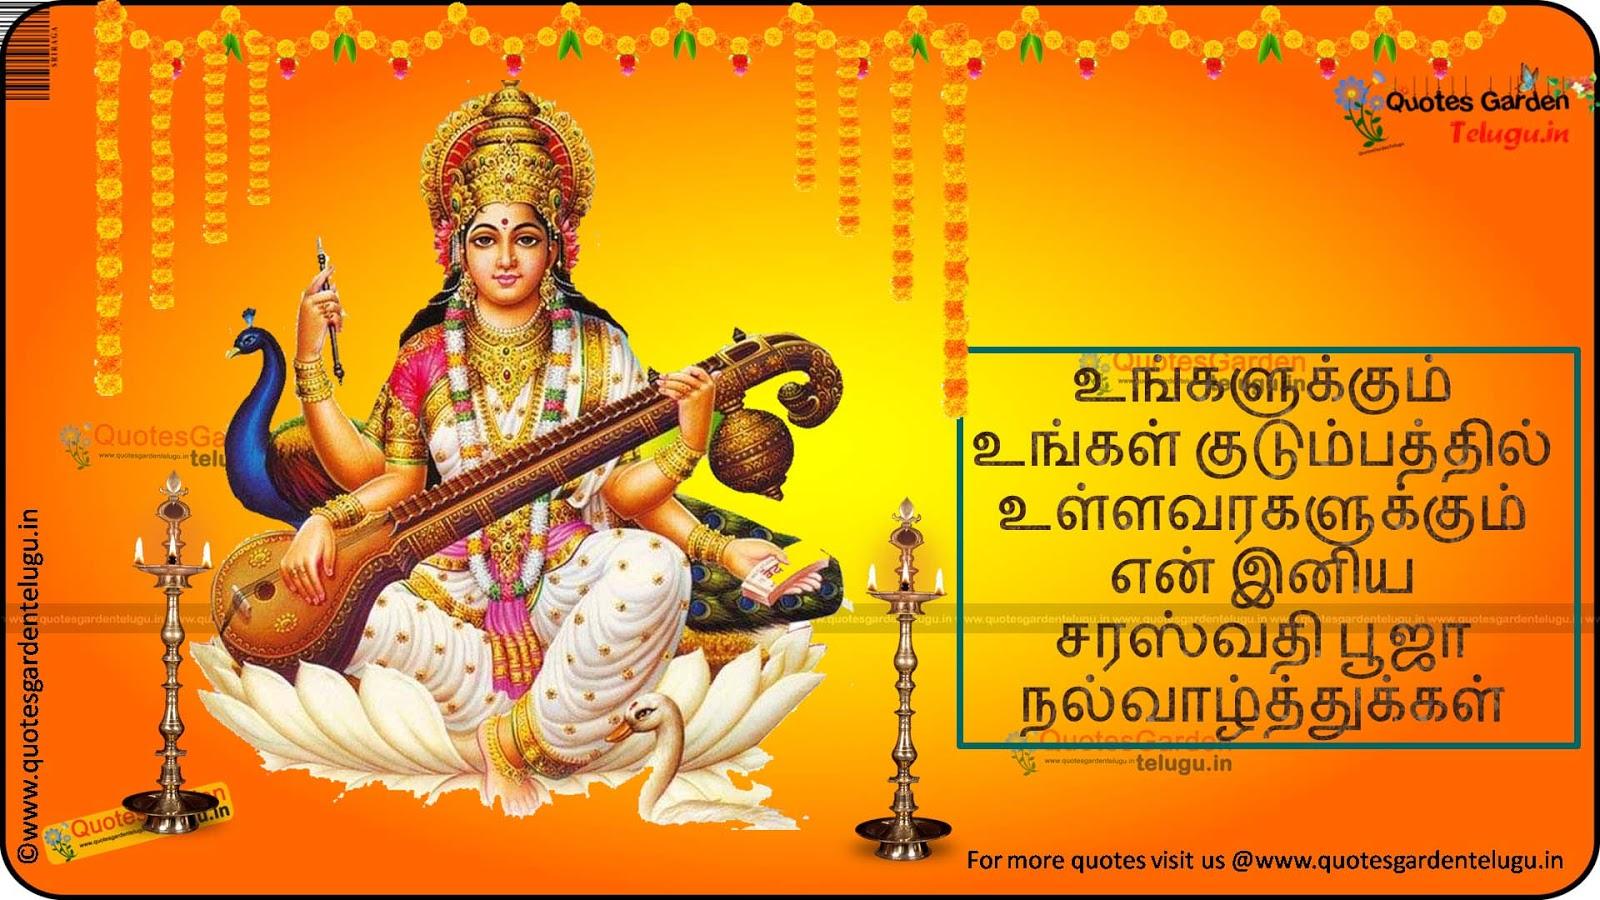 Saraswathi Puja Vijayadashami Greetings Wishes Quotes In Tamil